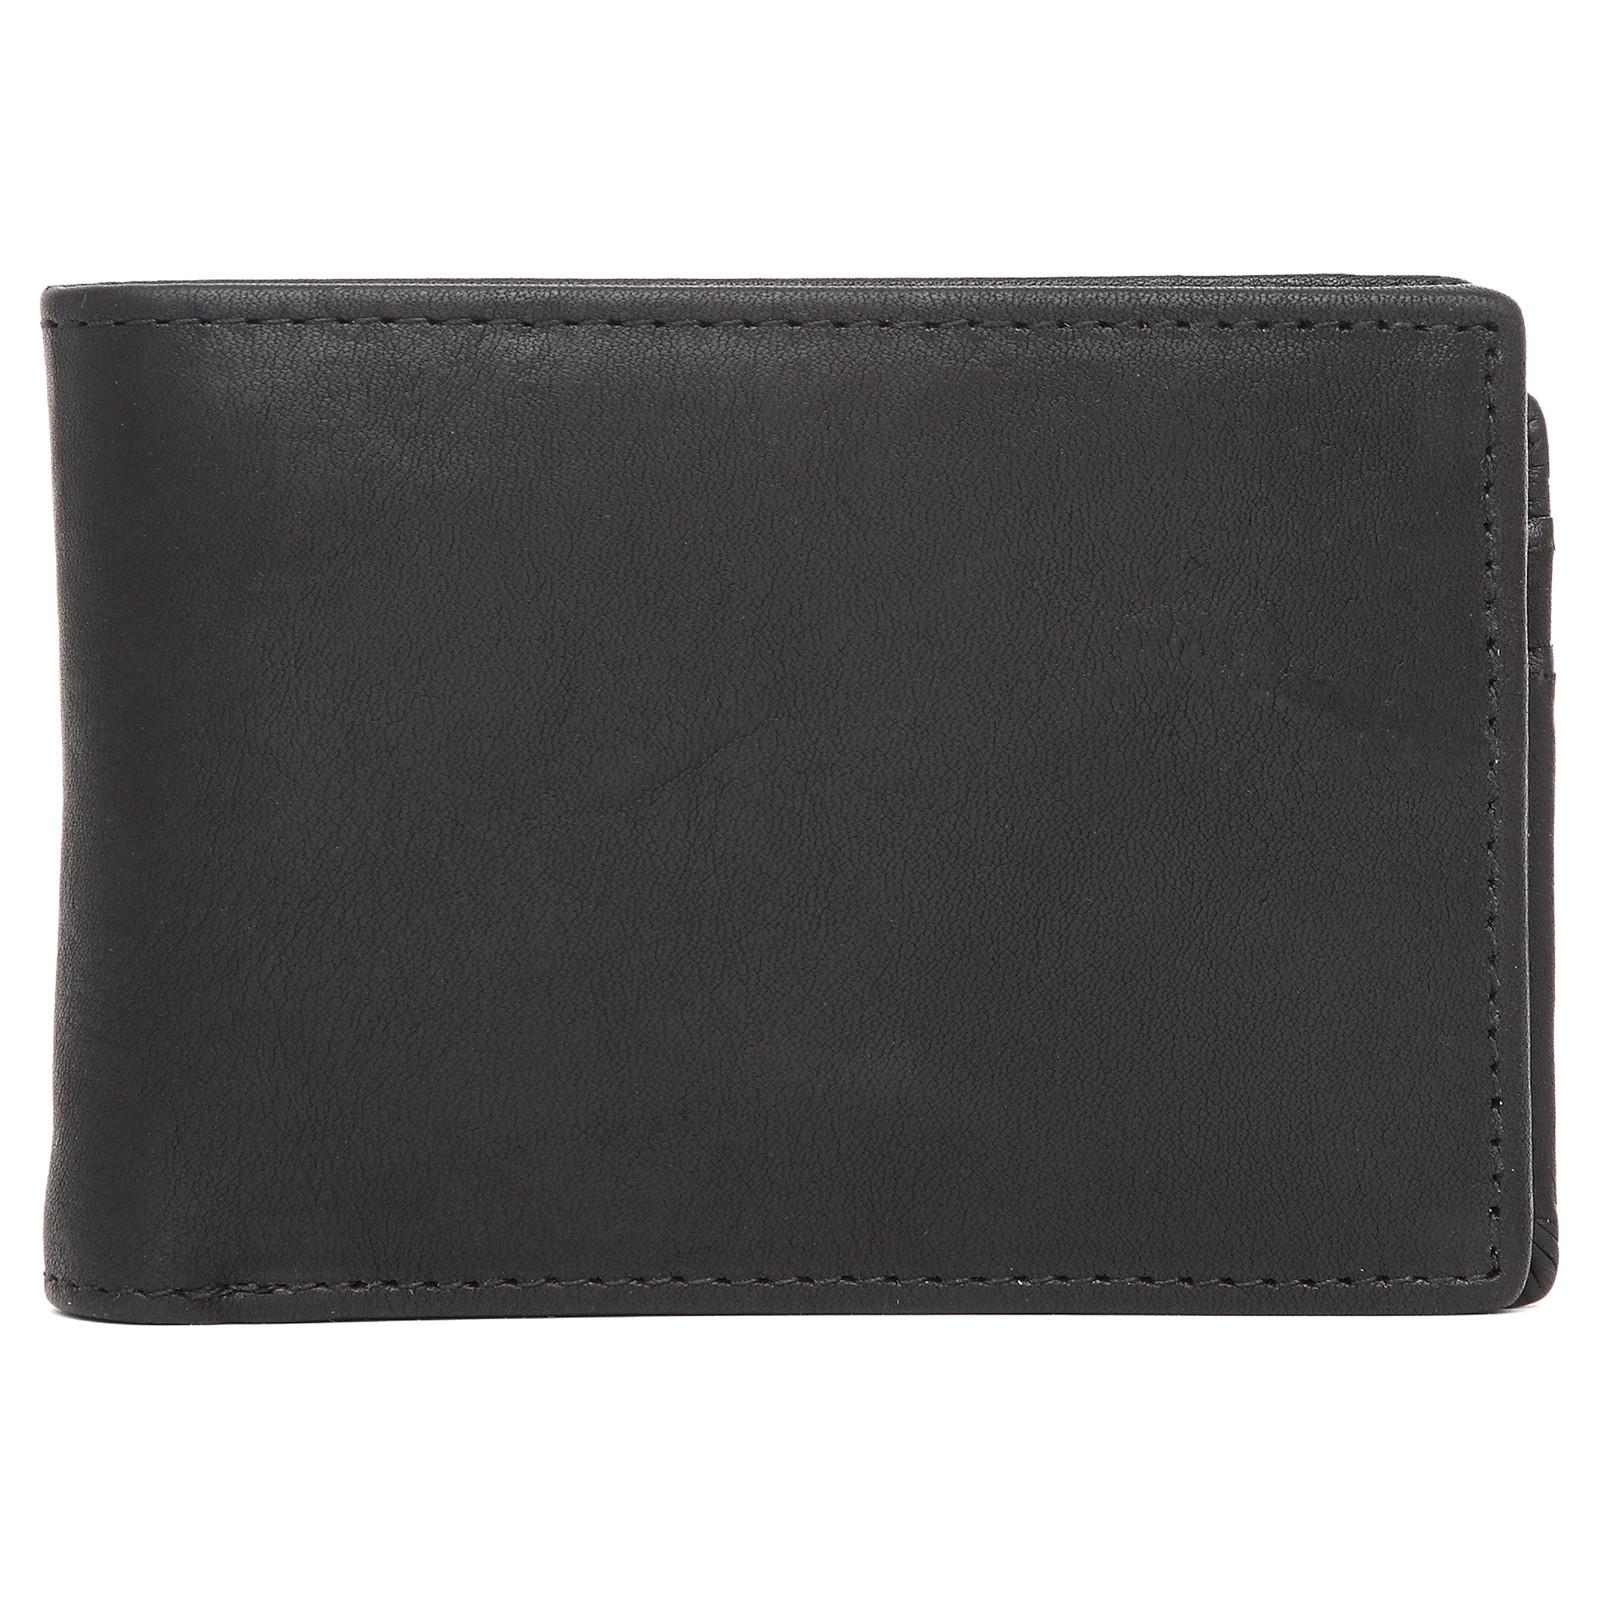 Adax Catania Lau Dollar med klap og 6 kreditkortholder